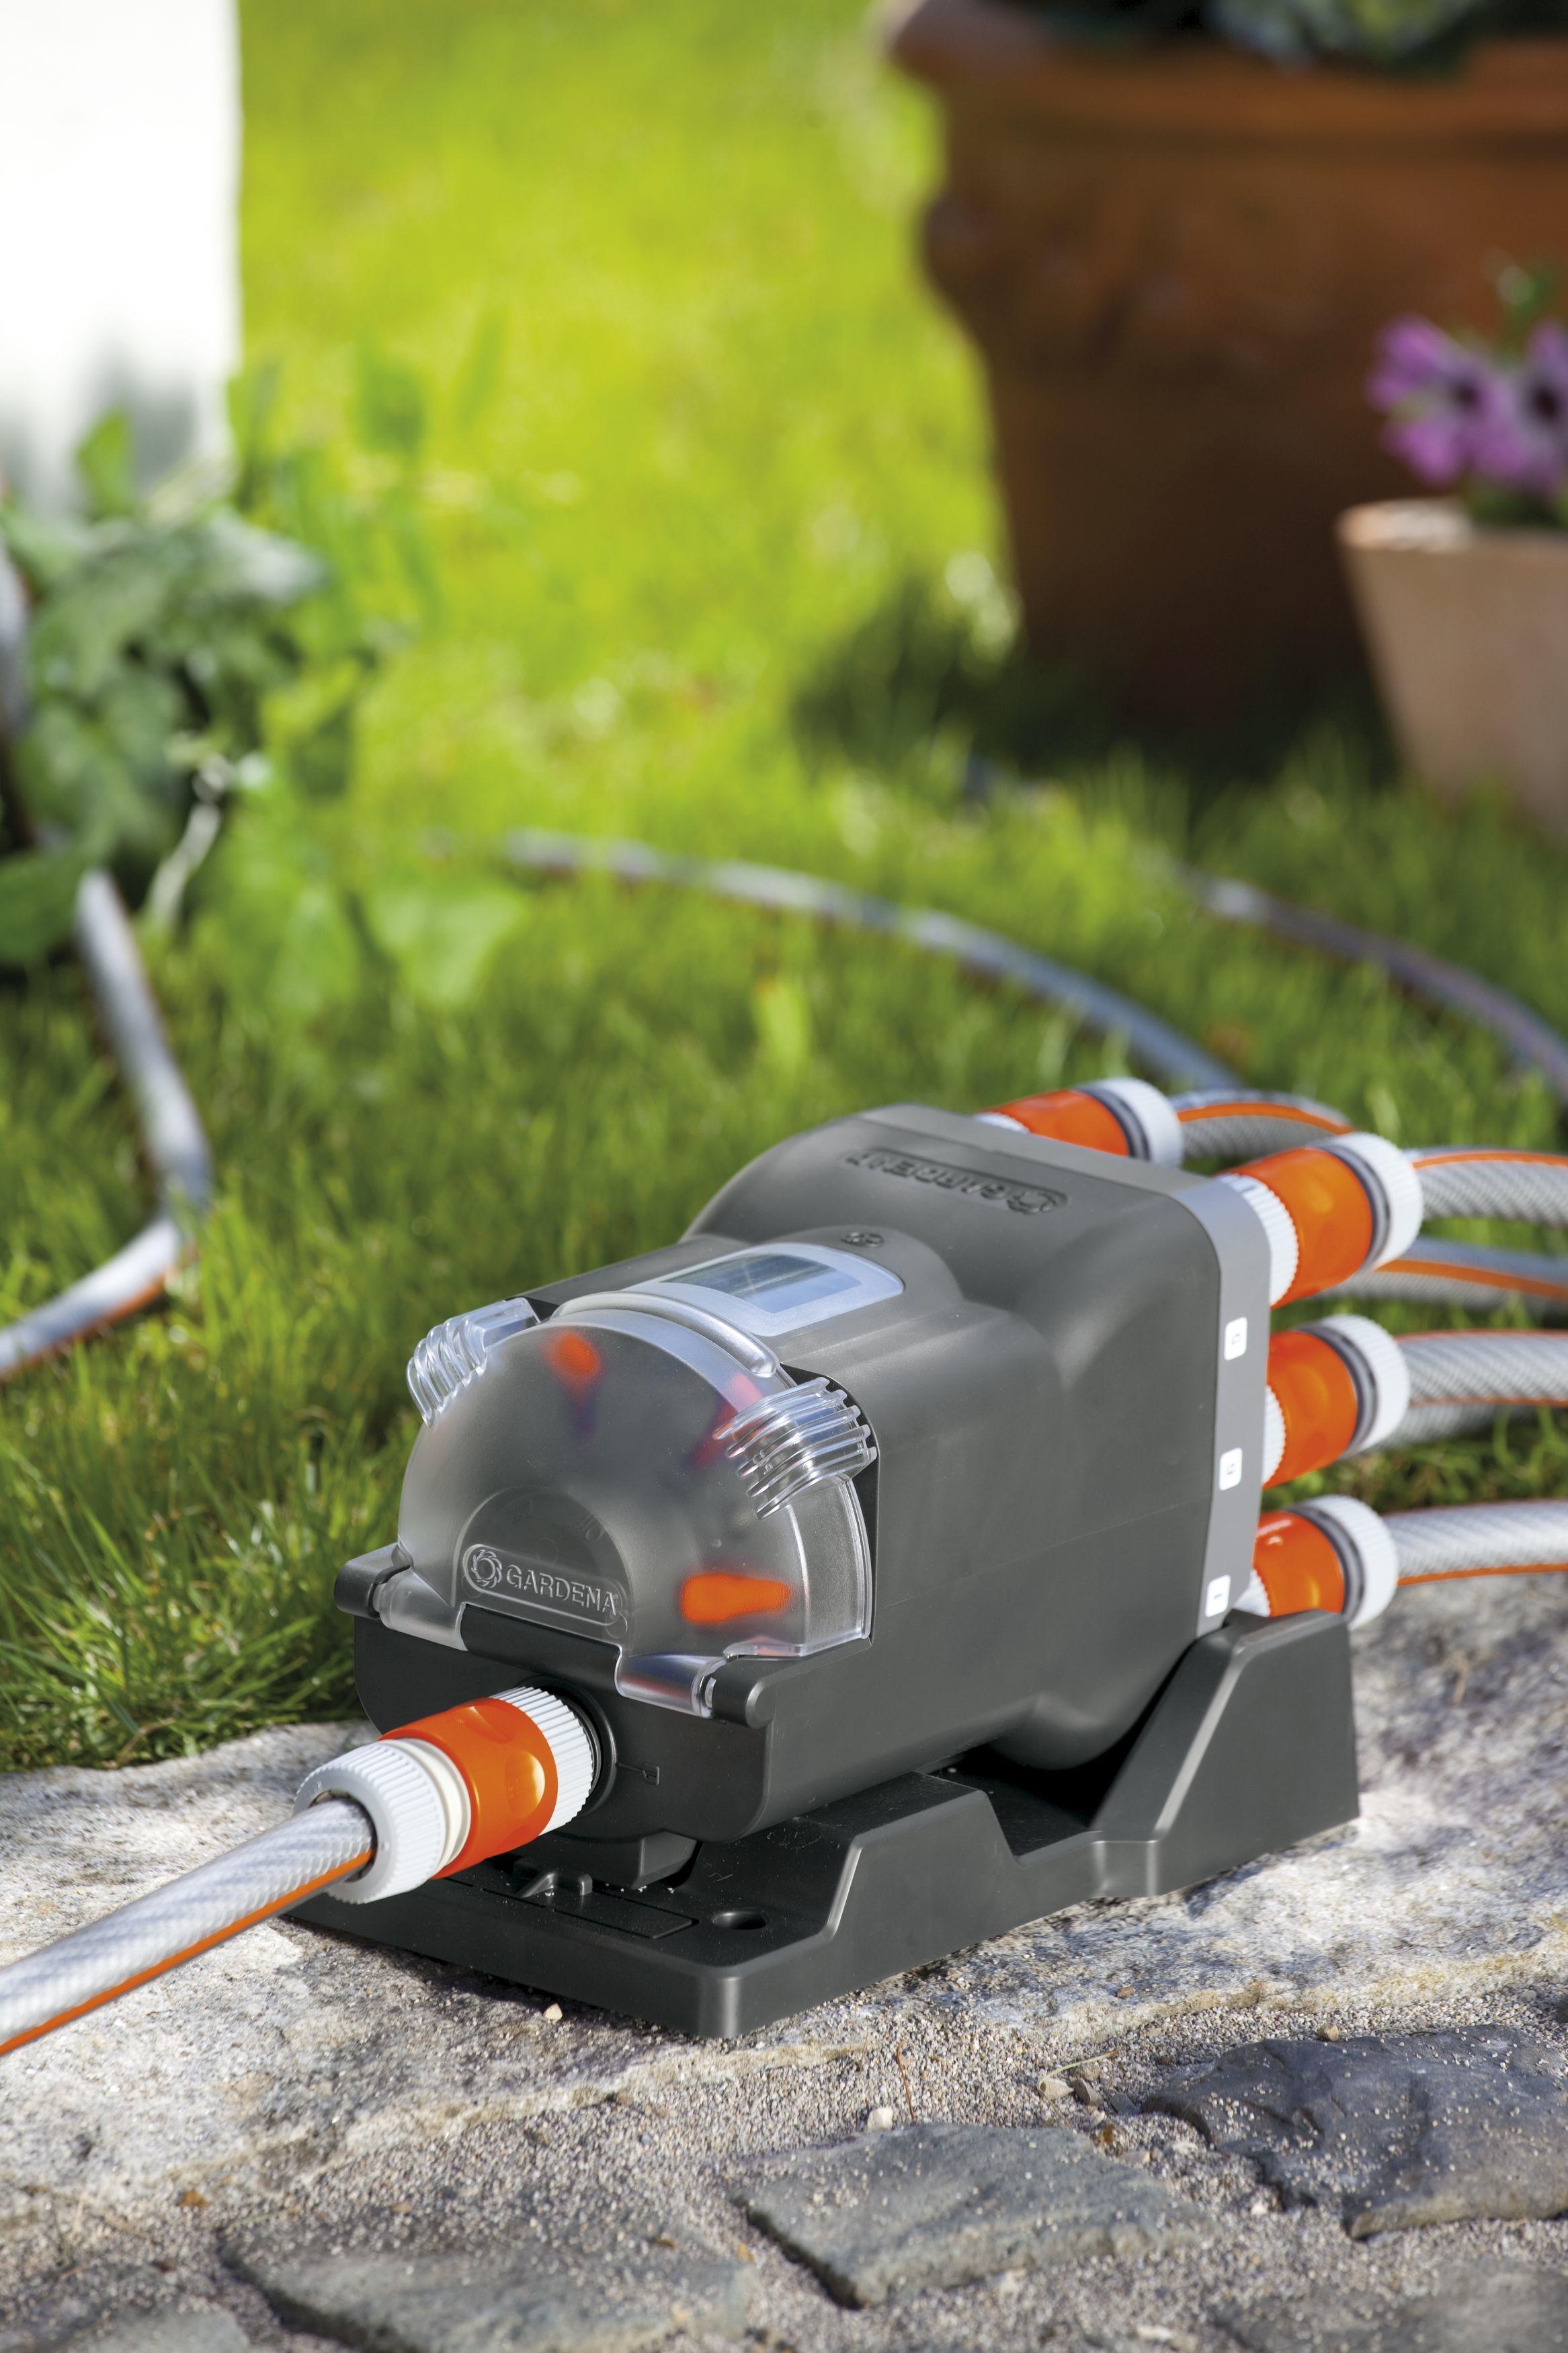 Gardena Pipeline Automatische